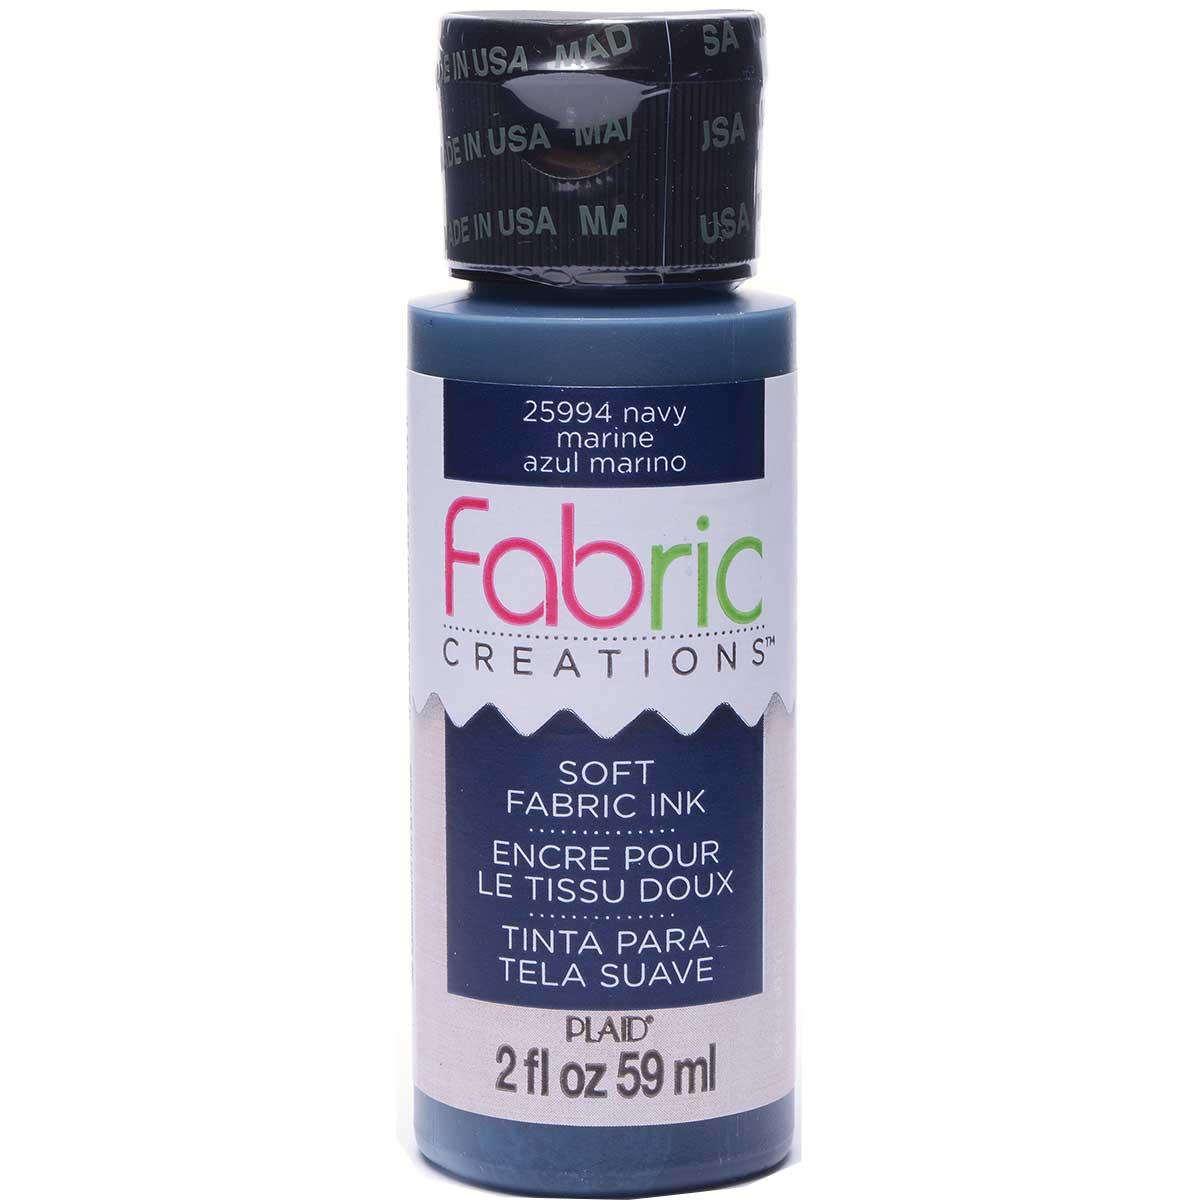 Fabric Creations™ Soft Fabric Inks - Navy, 2 oz.